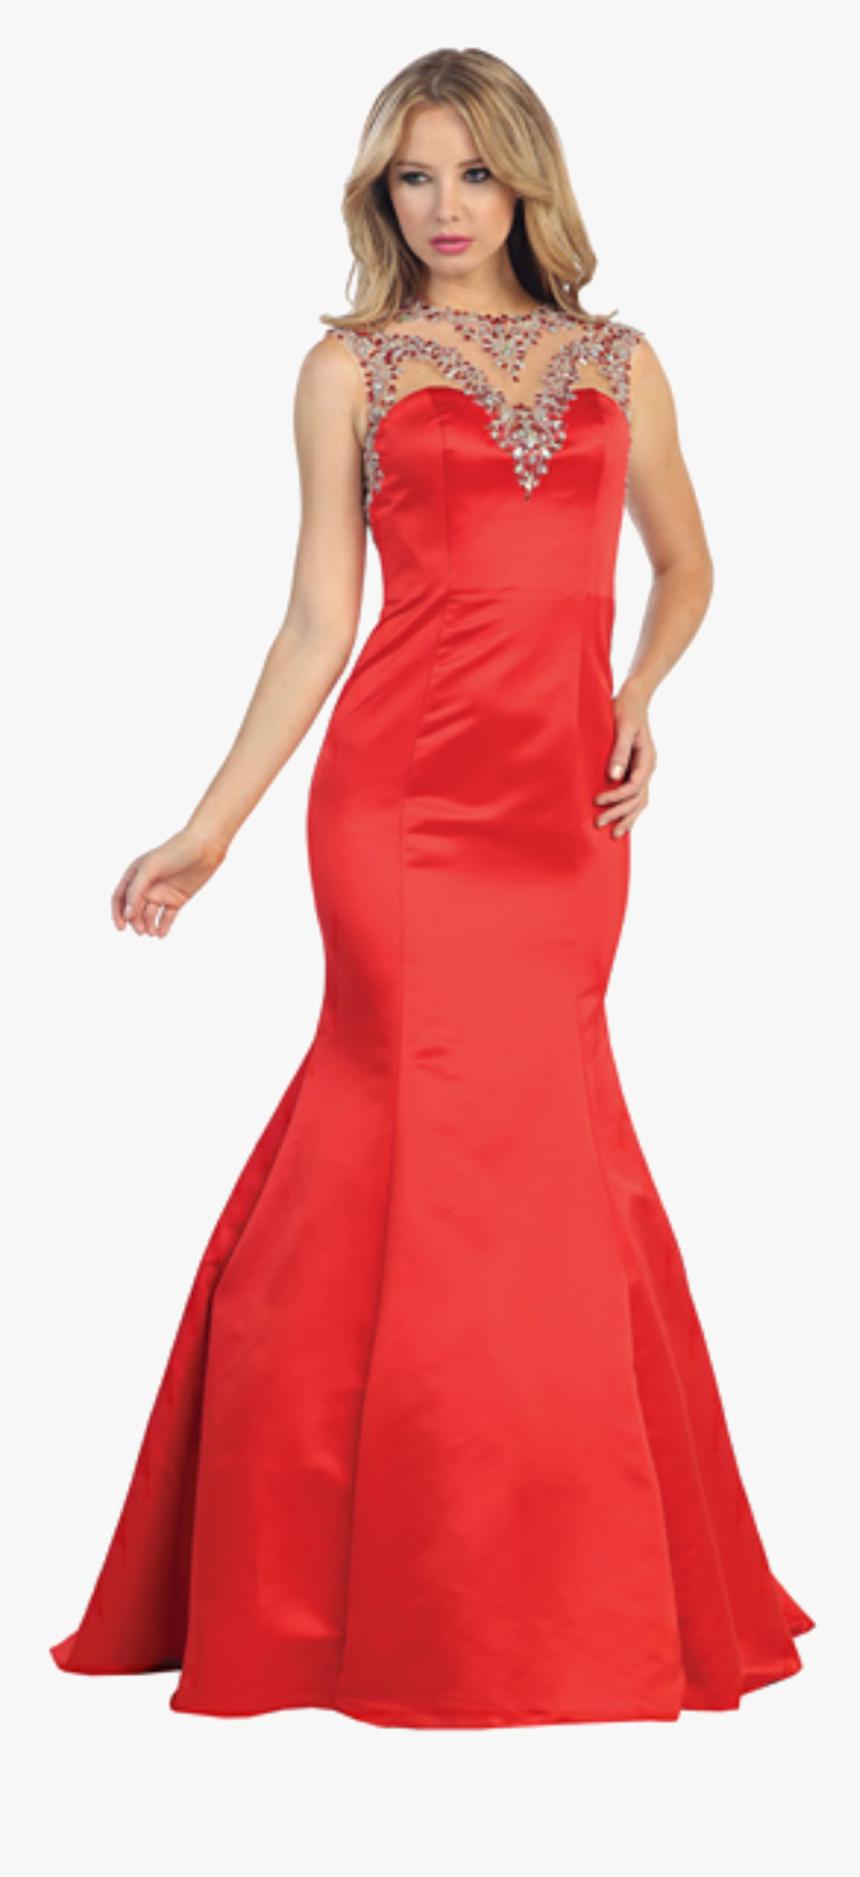 Cocktail Dresses For Prom Transparent Image - Prom Vestidos Png, Png Download, Free Download